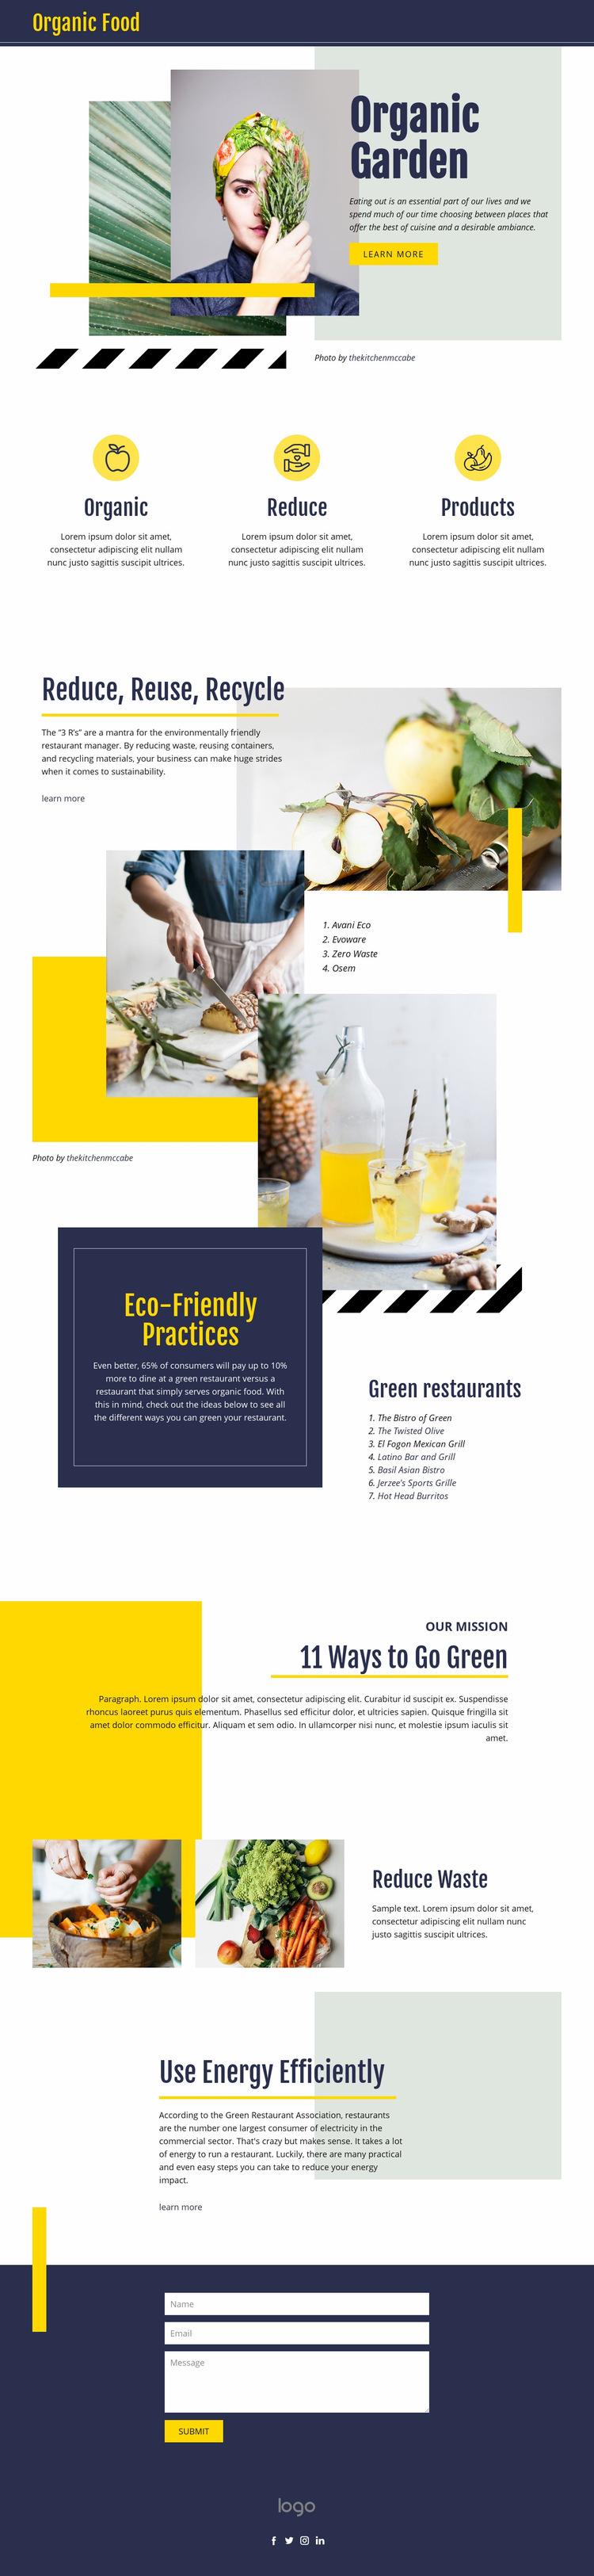 Organic natural food Web Page Design